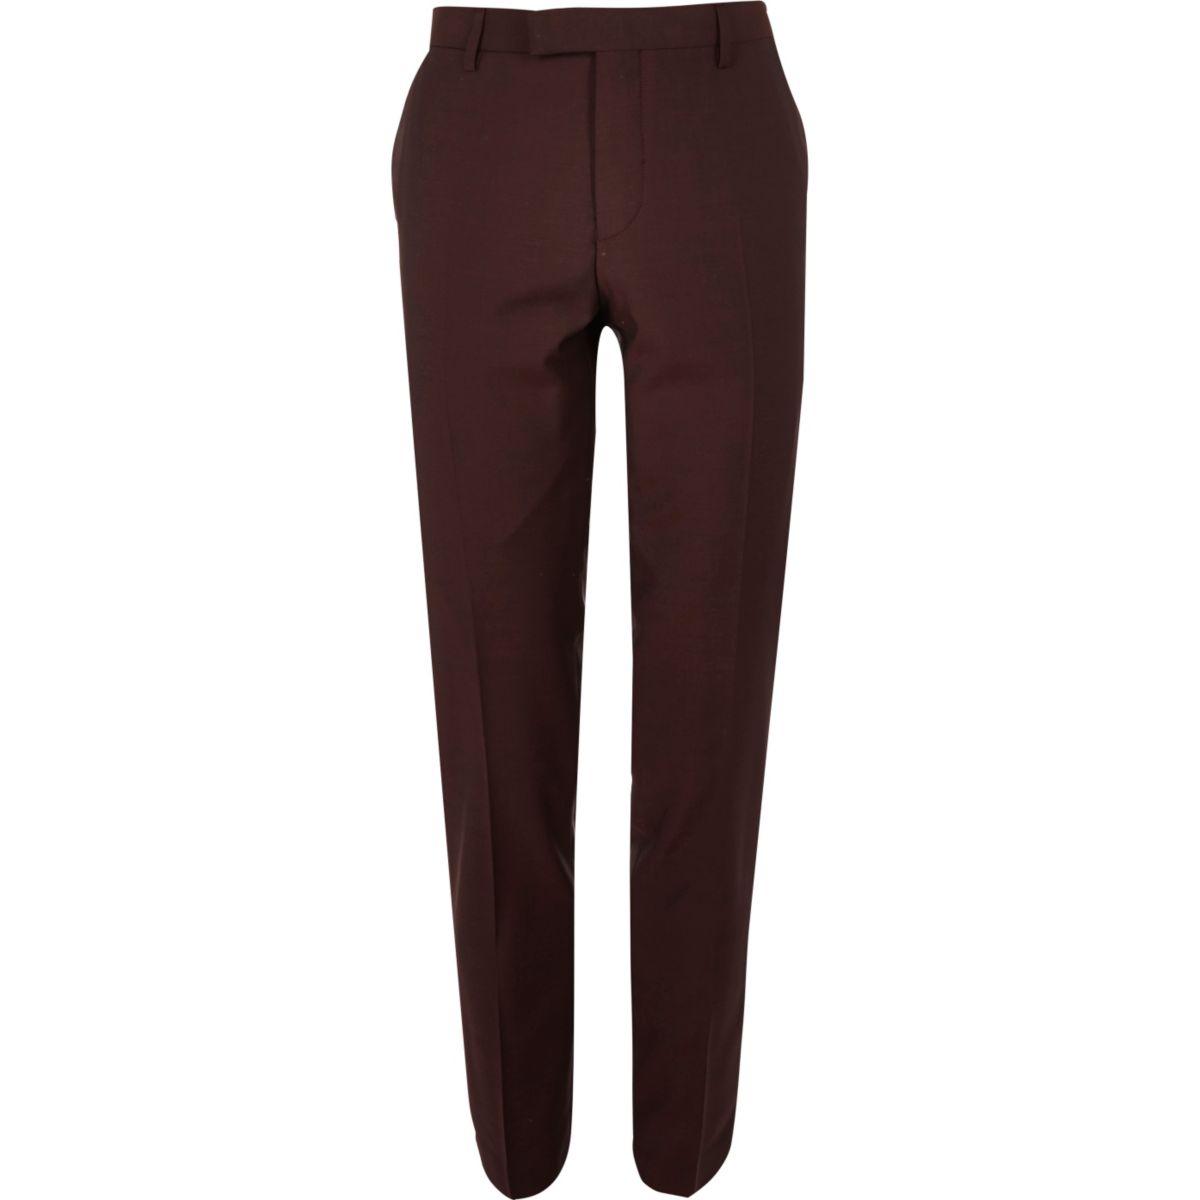 Bessenrode skinny-fit pantalon